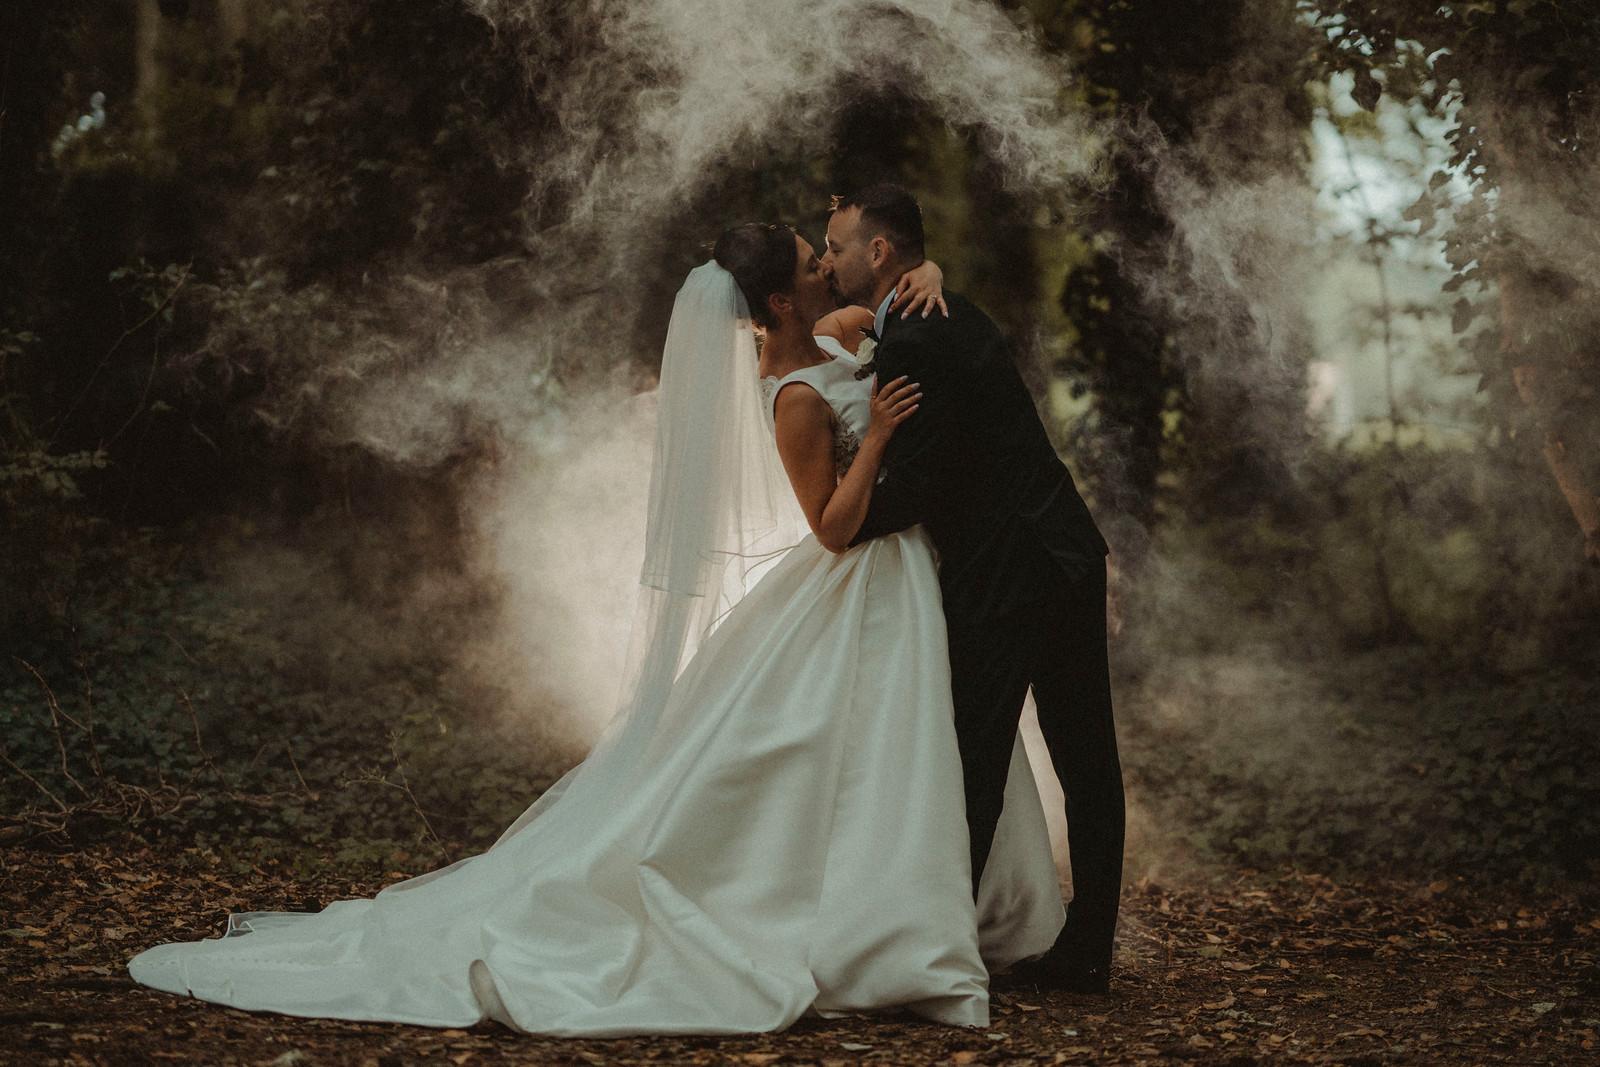 Bride and groom kiss with smoke around them| Wedding Photographer and Videographer